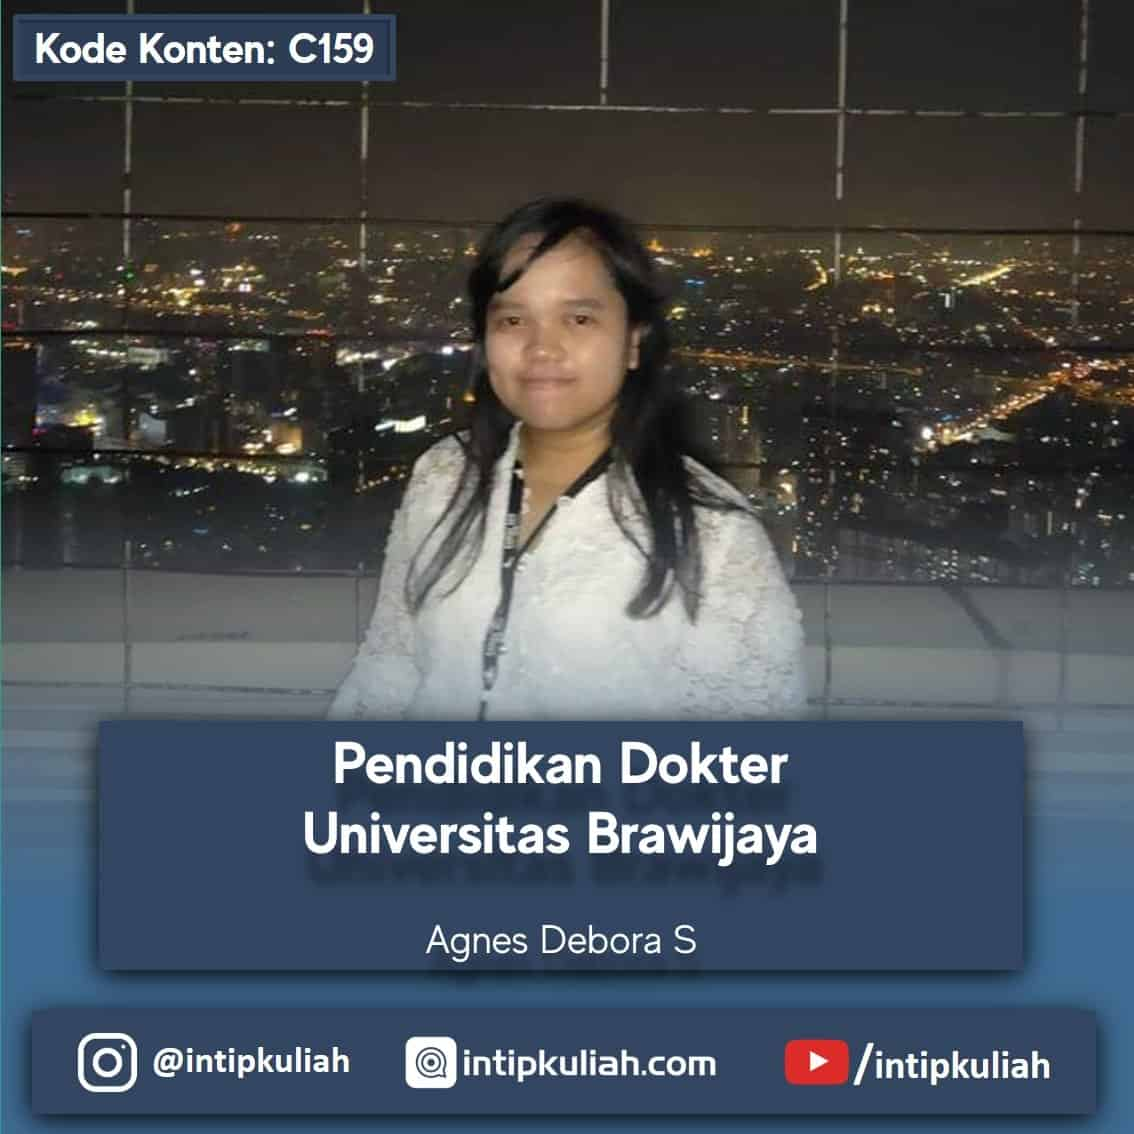 Kedokteran Universitas Brawijaya (Agnes)